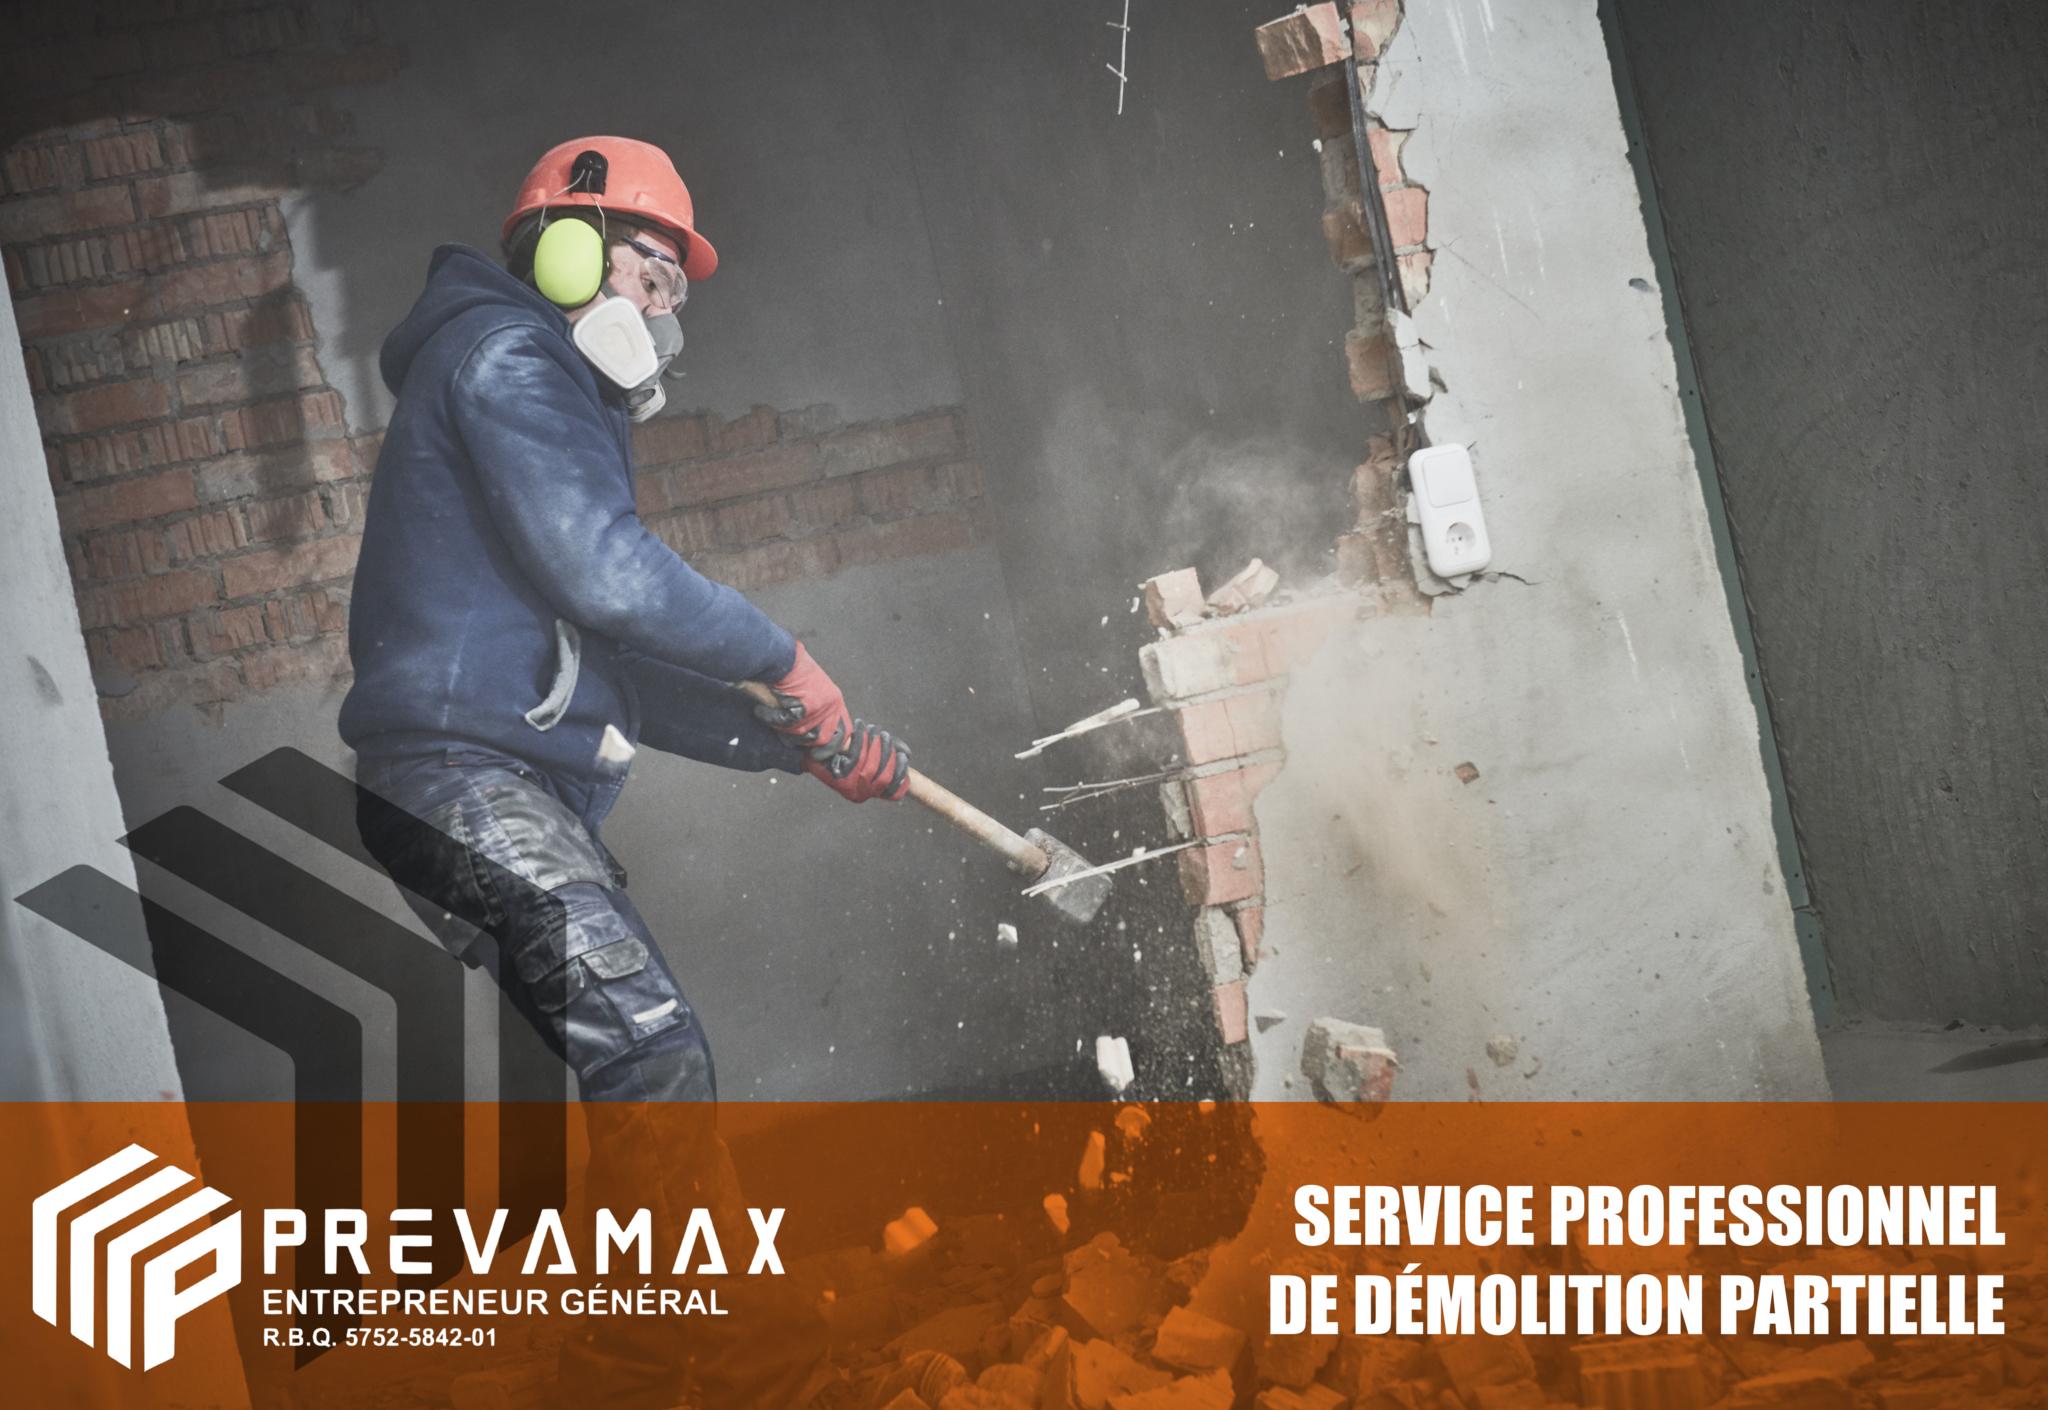 Prévamax - Entrepreneur Général